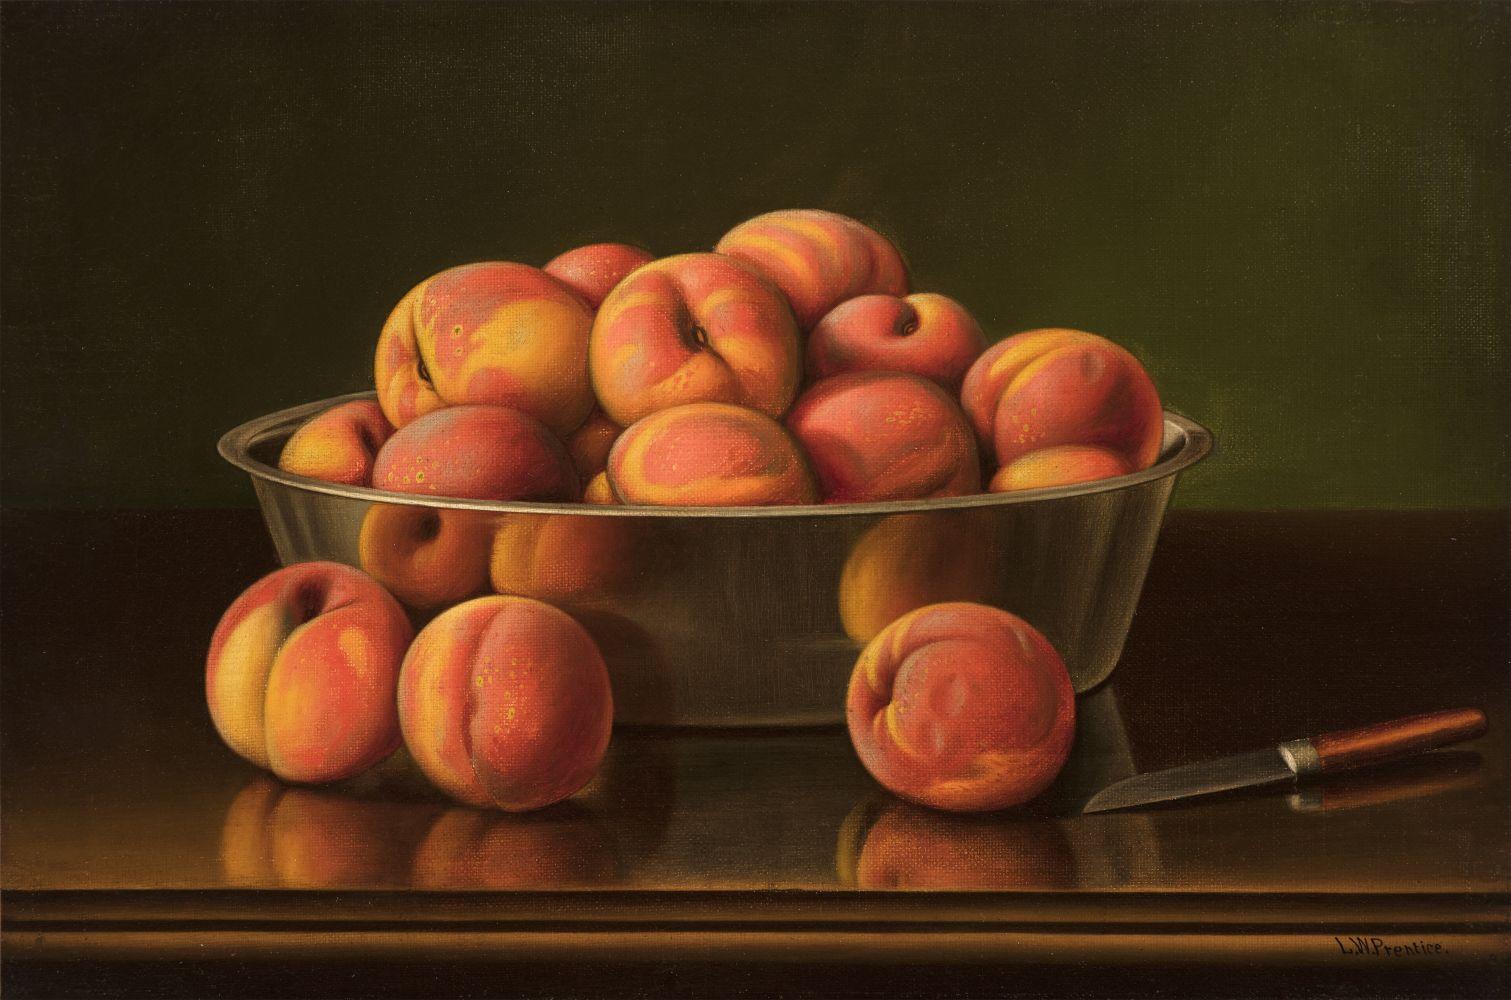 Levi Wells Prentice (1851–1935), Peaches in a Silver Bowl, oil on canvas, 12 x 18 in., signed lower right: L. W. Prentice